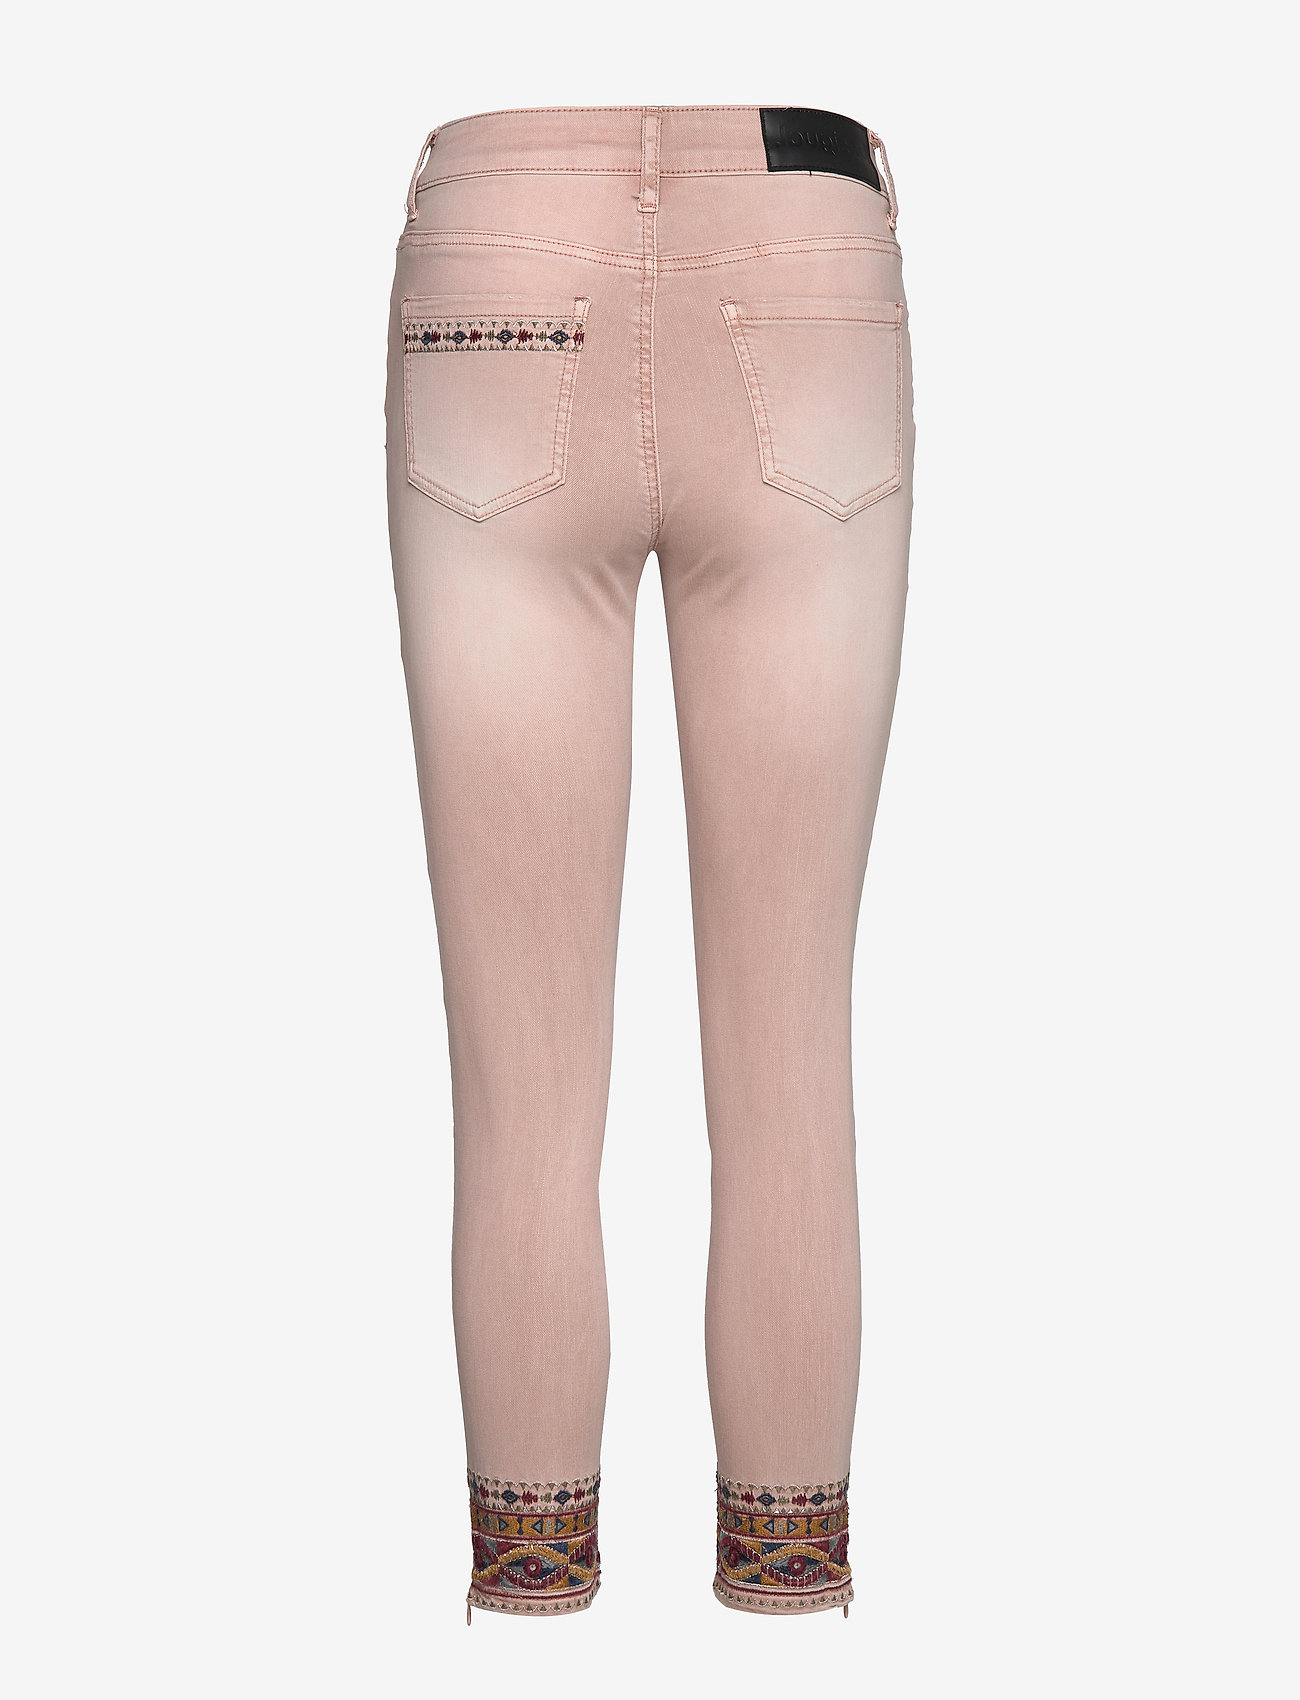 Desigual - PANT AFRI - slim jeans - rosa palo - 1